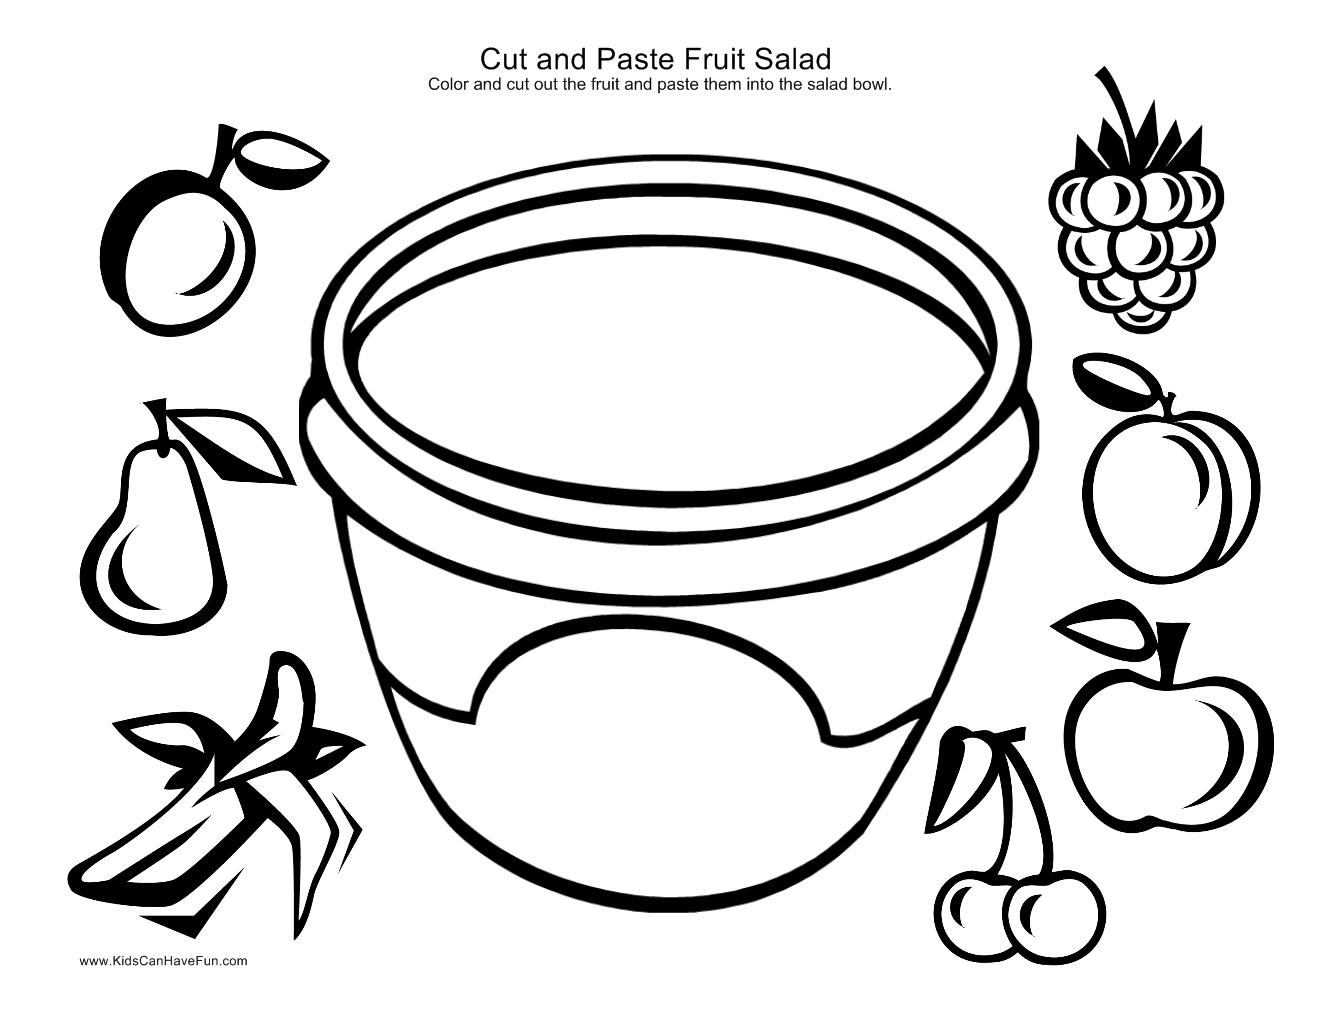 Cut And Paste Fruit Salad